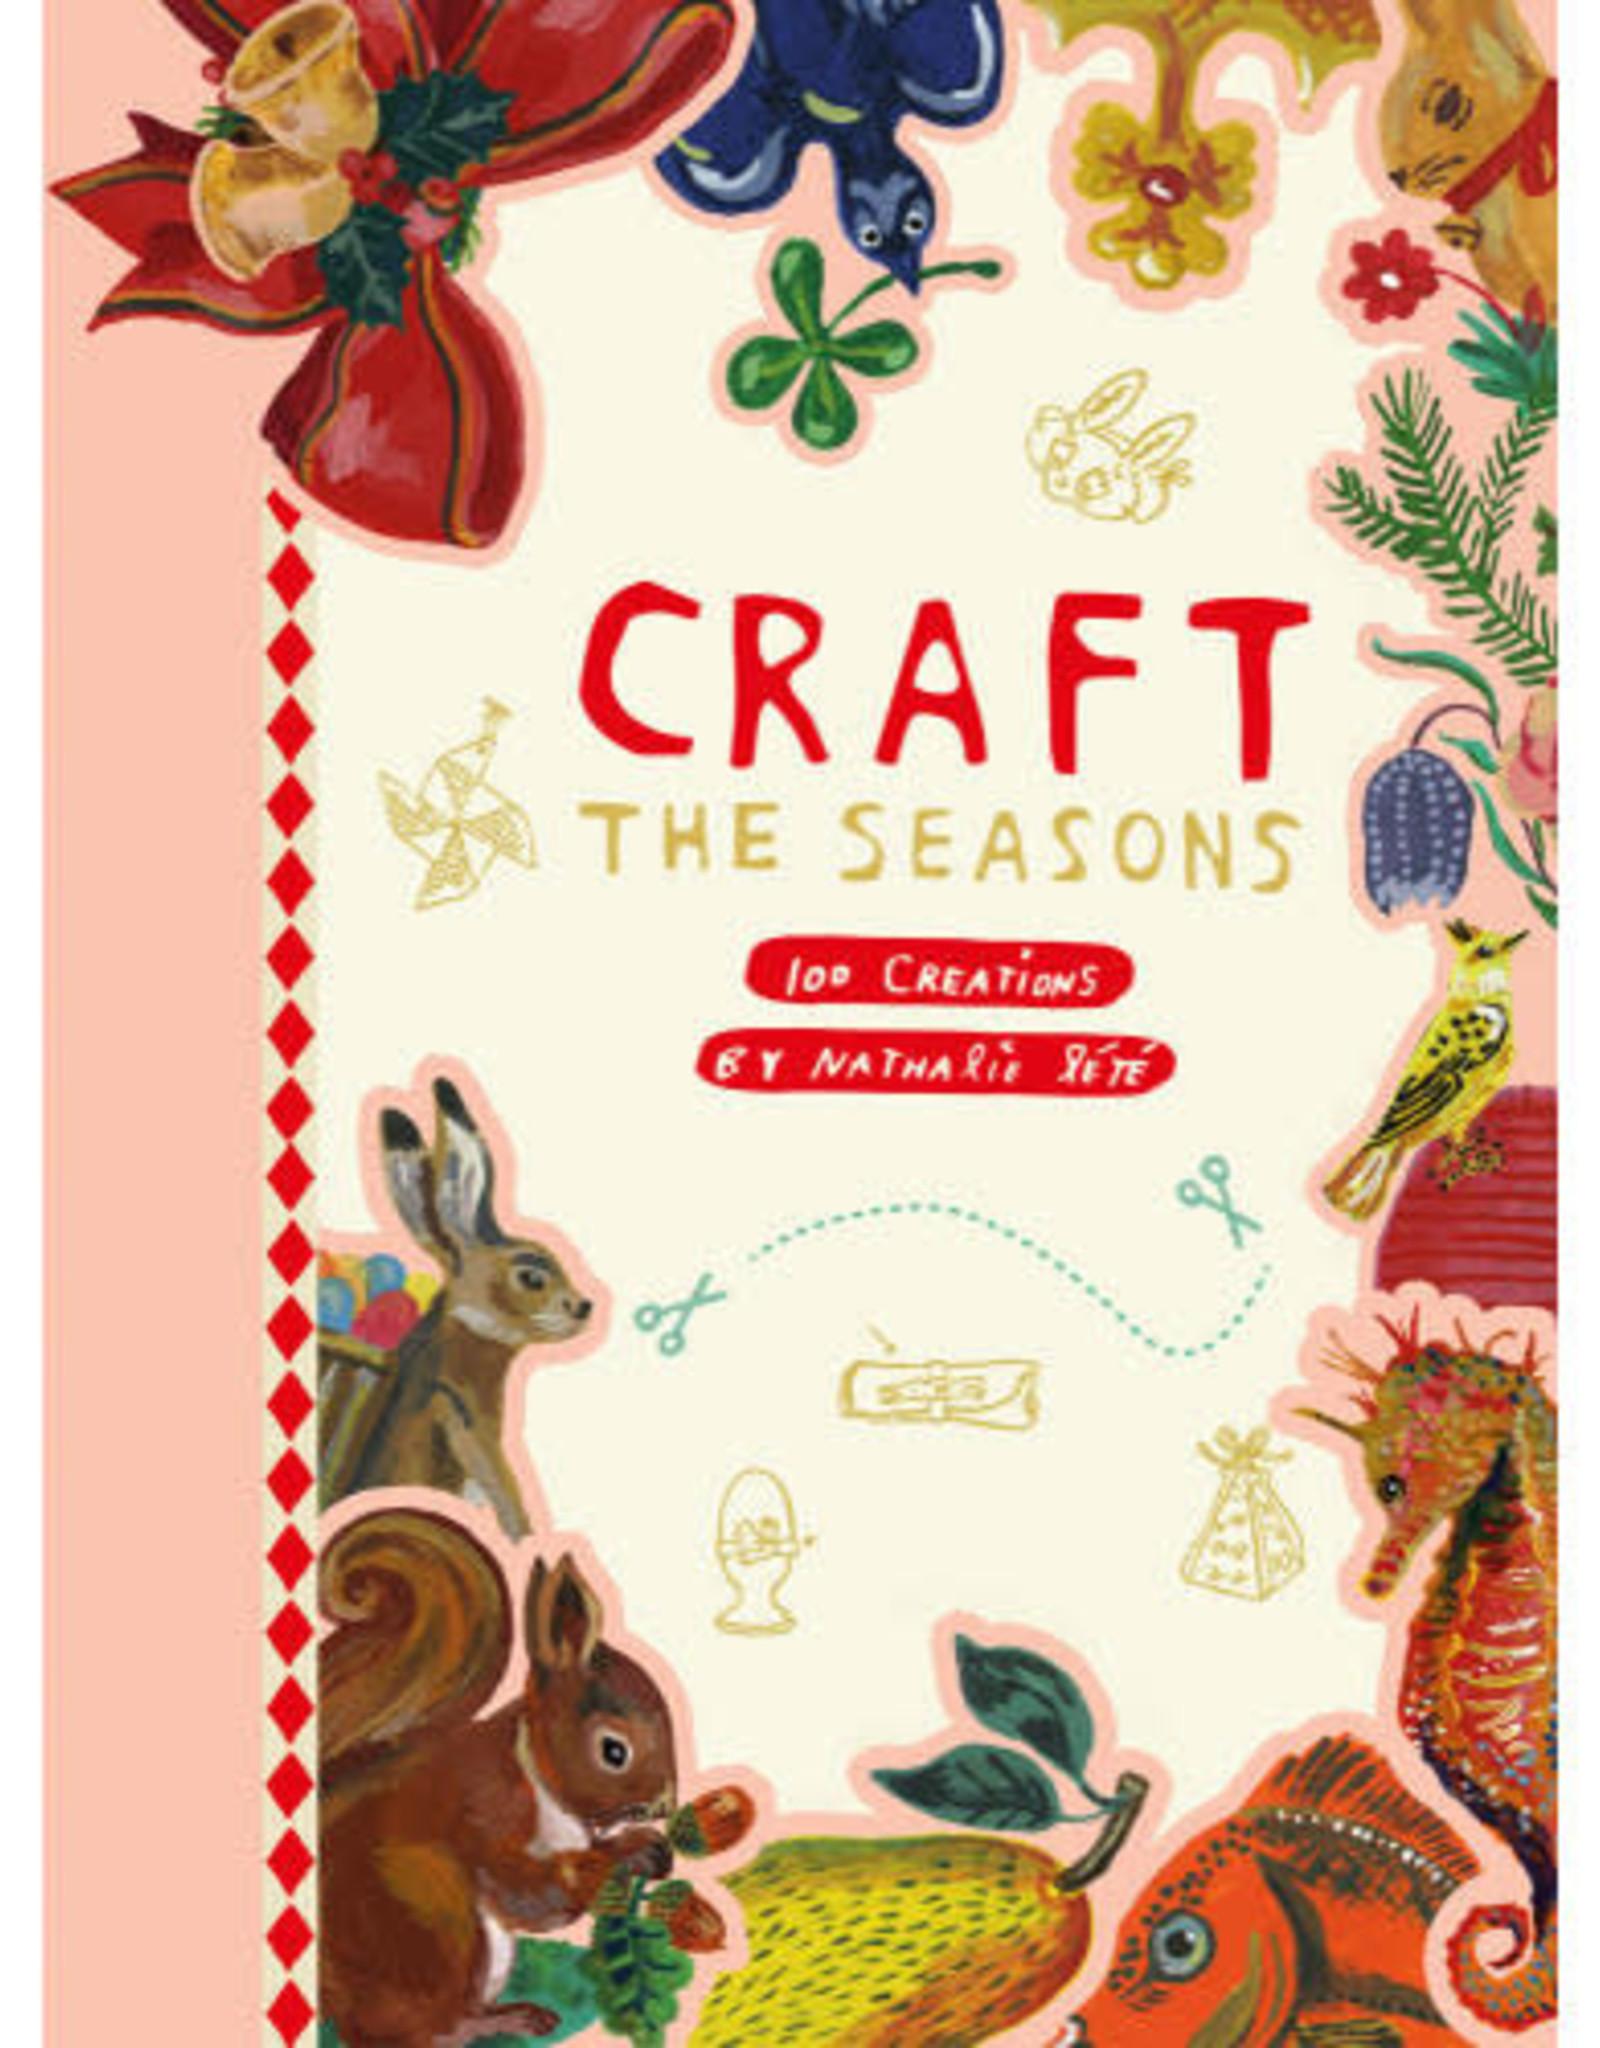 Abrams-Stewart Tabori & Chang Craft The Seasons